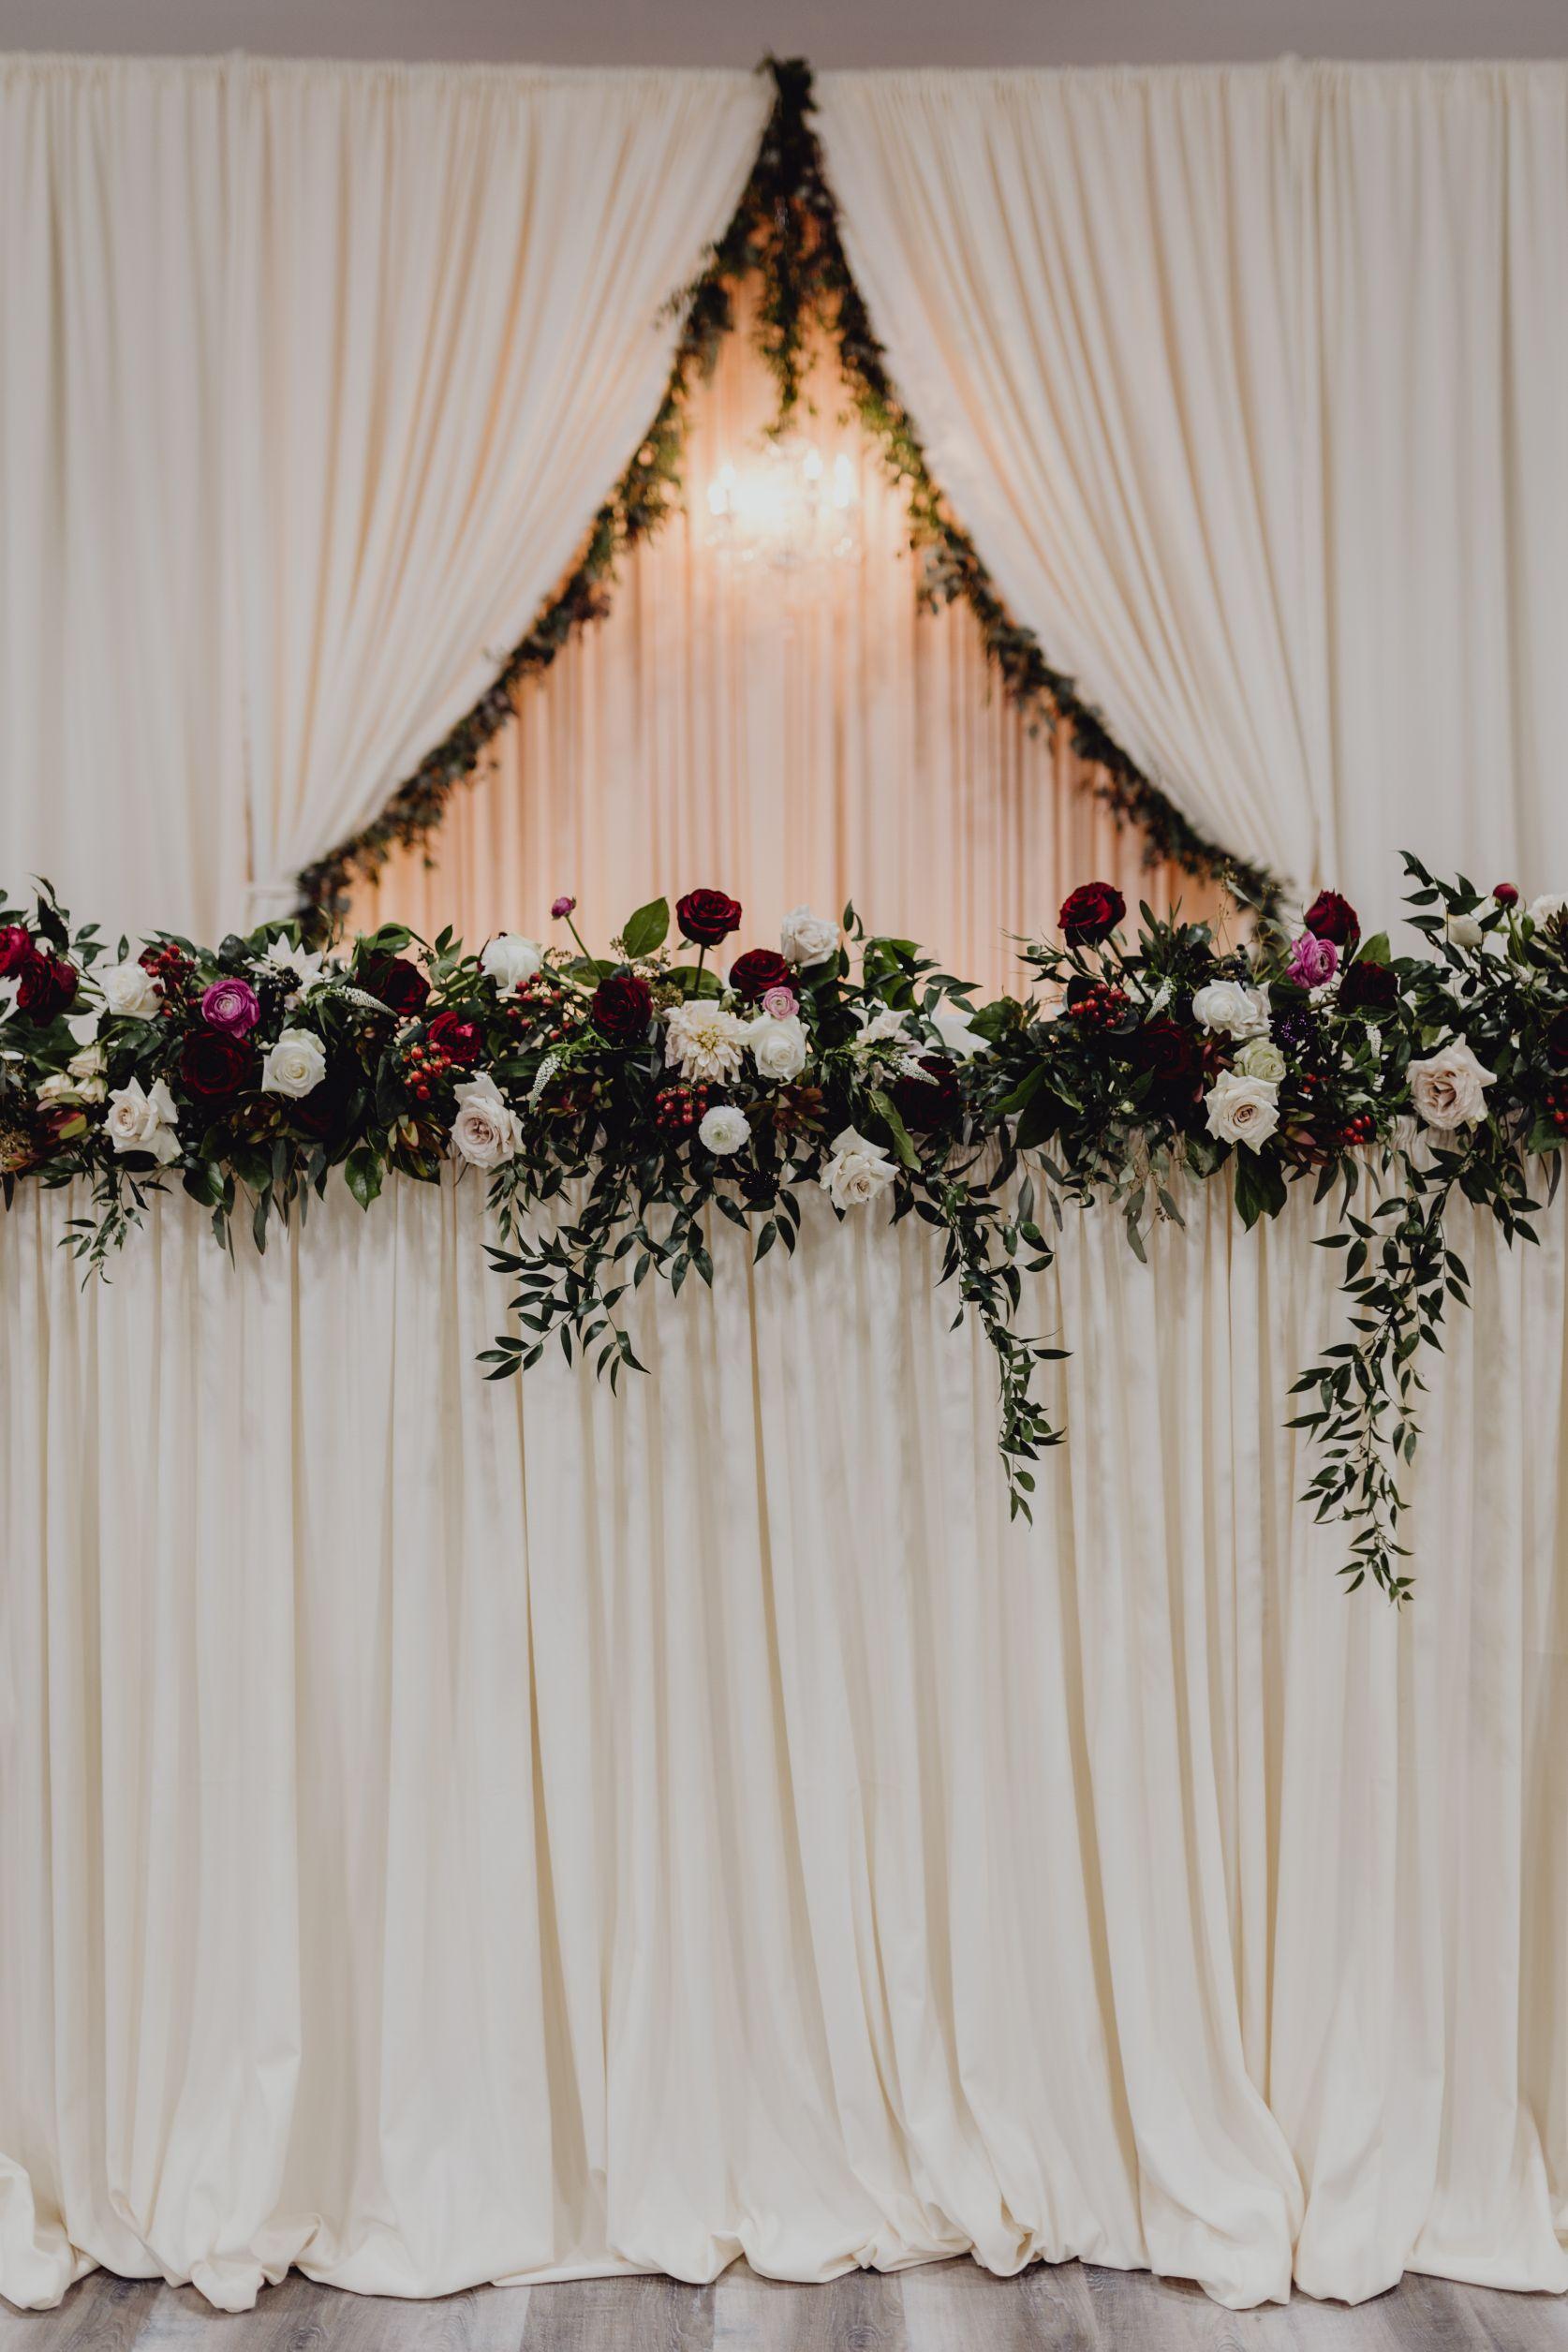 North-Dallas-Wedding-Florist-David-Co.-14.jpg